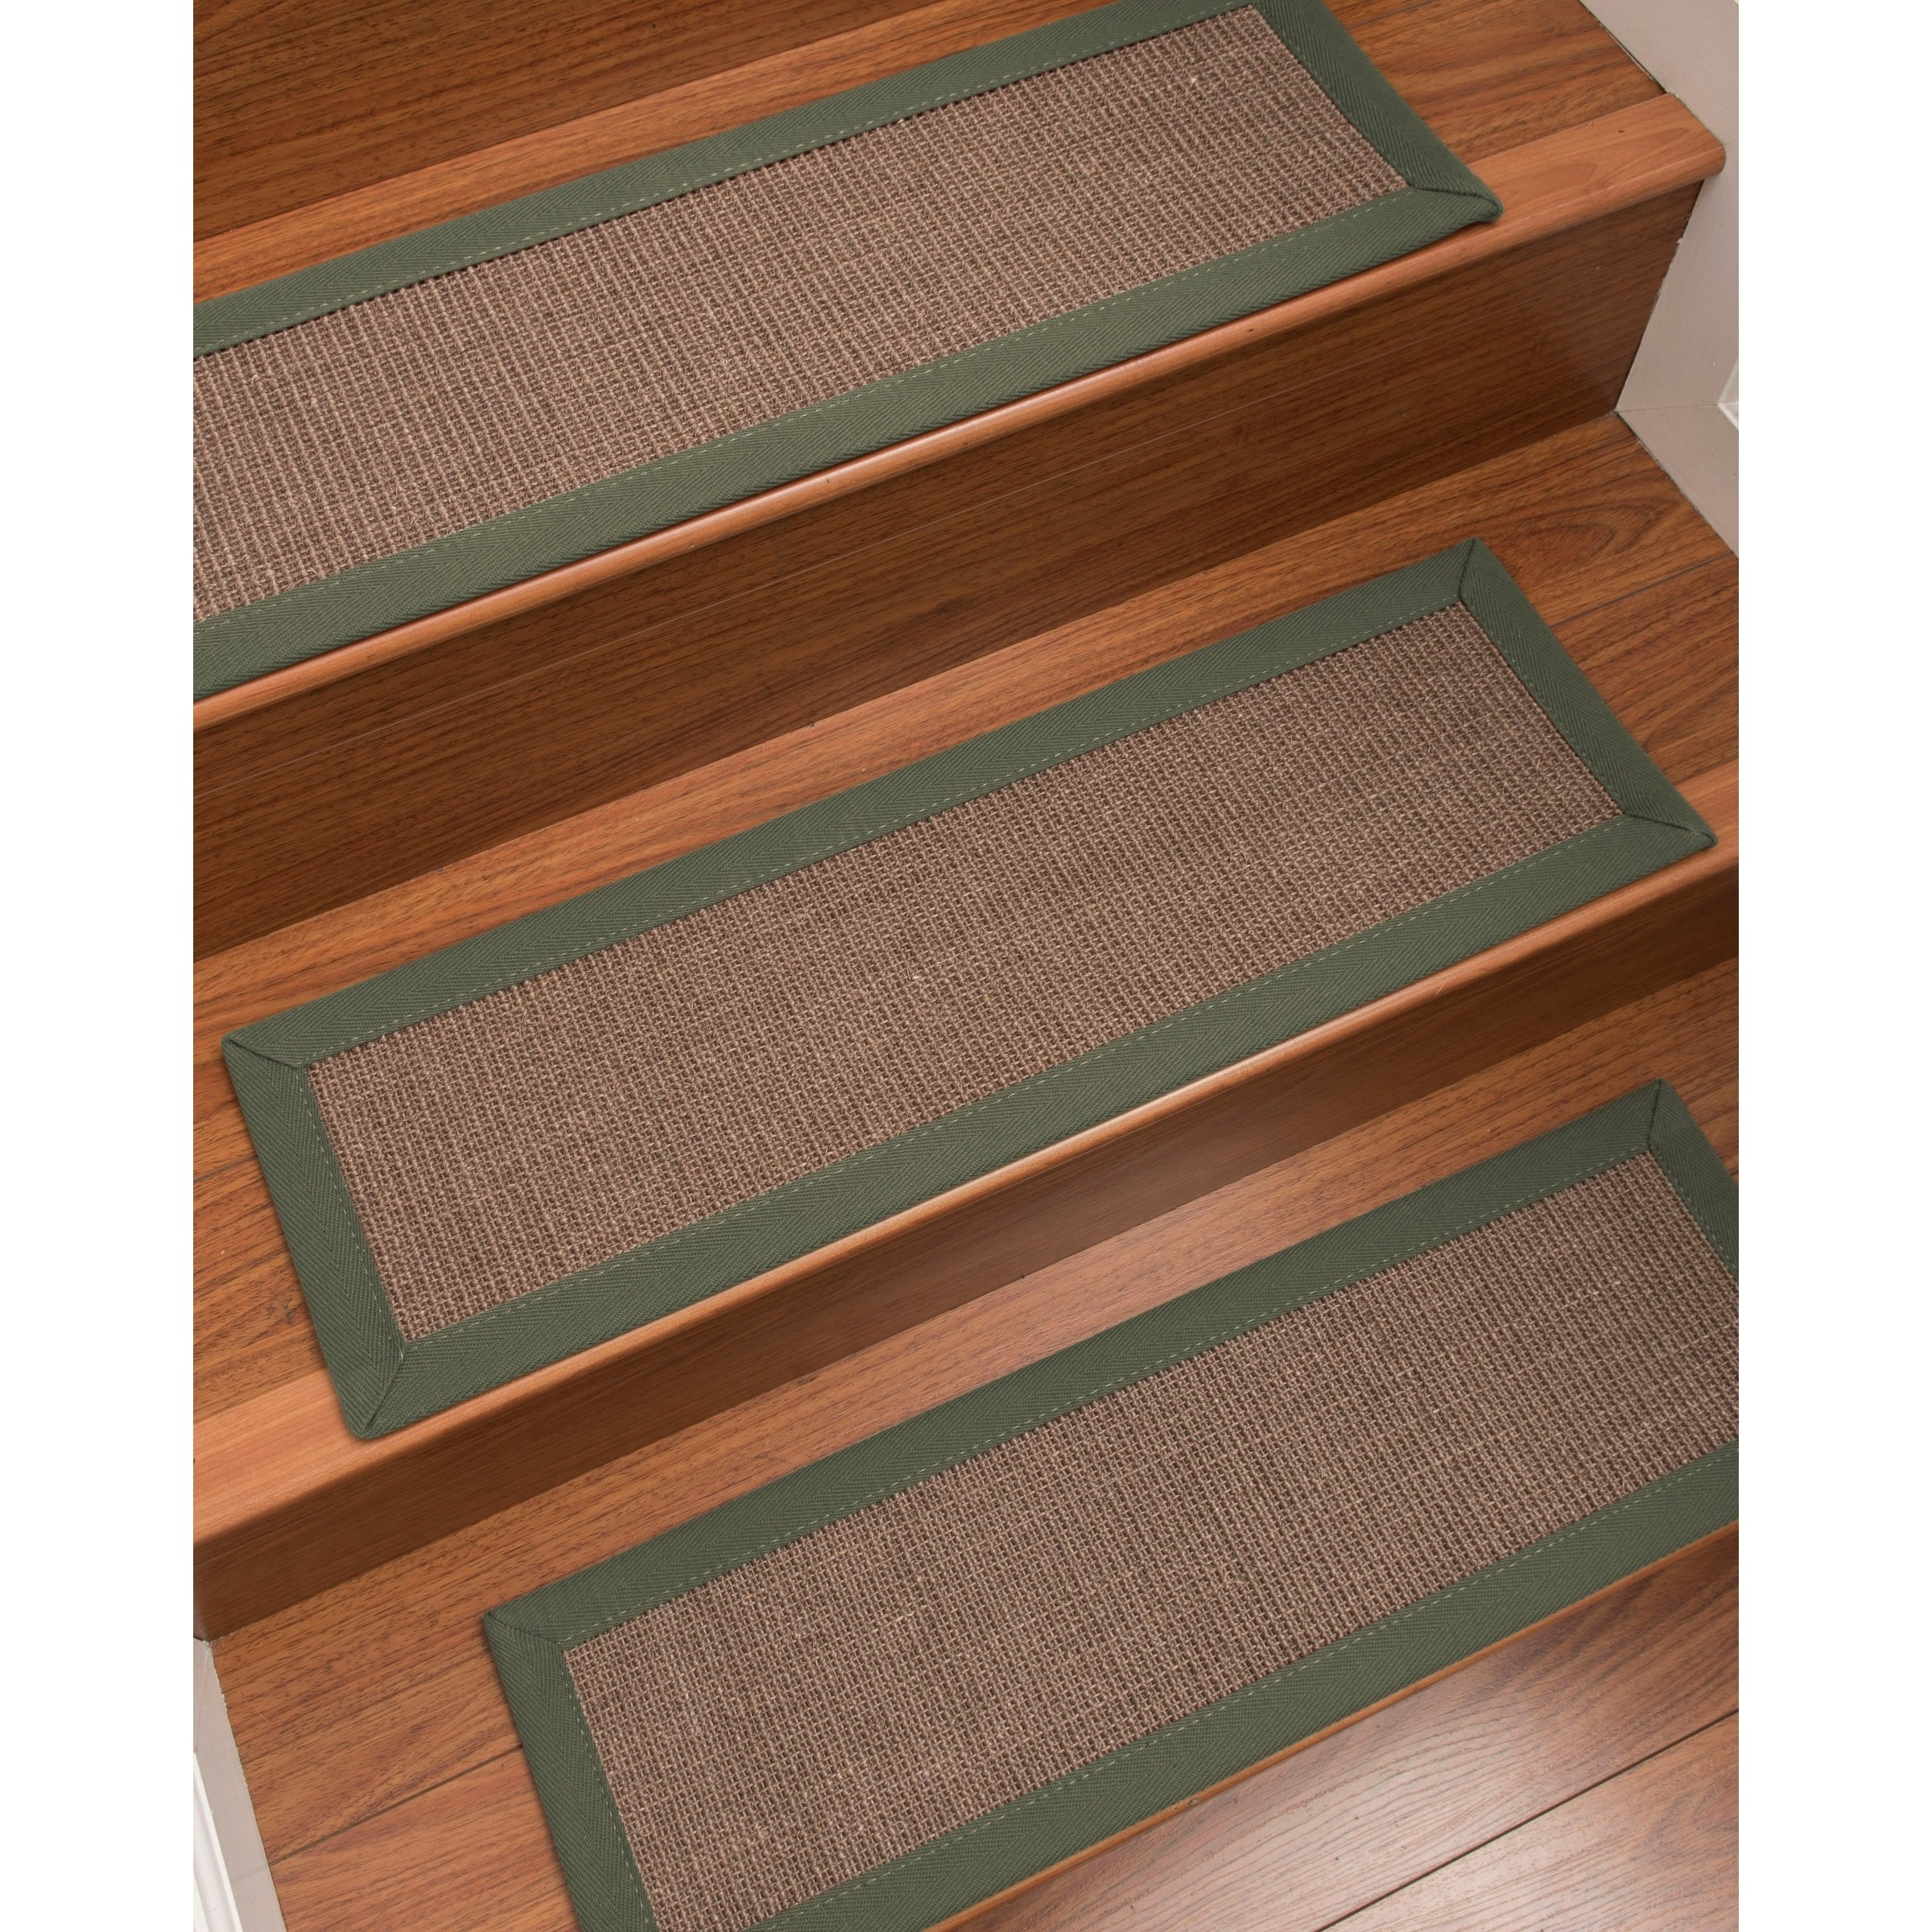 Best Naturalarearugs Linden Carpet Stair Treads Set Of 13 9 400 x 300